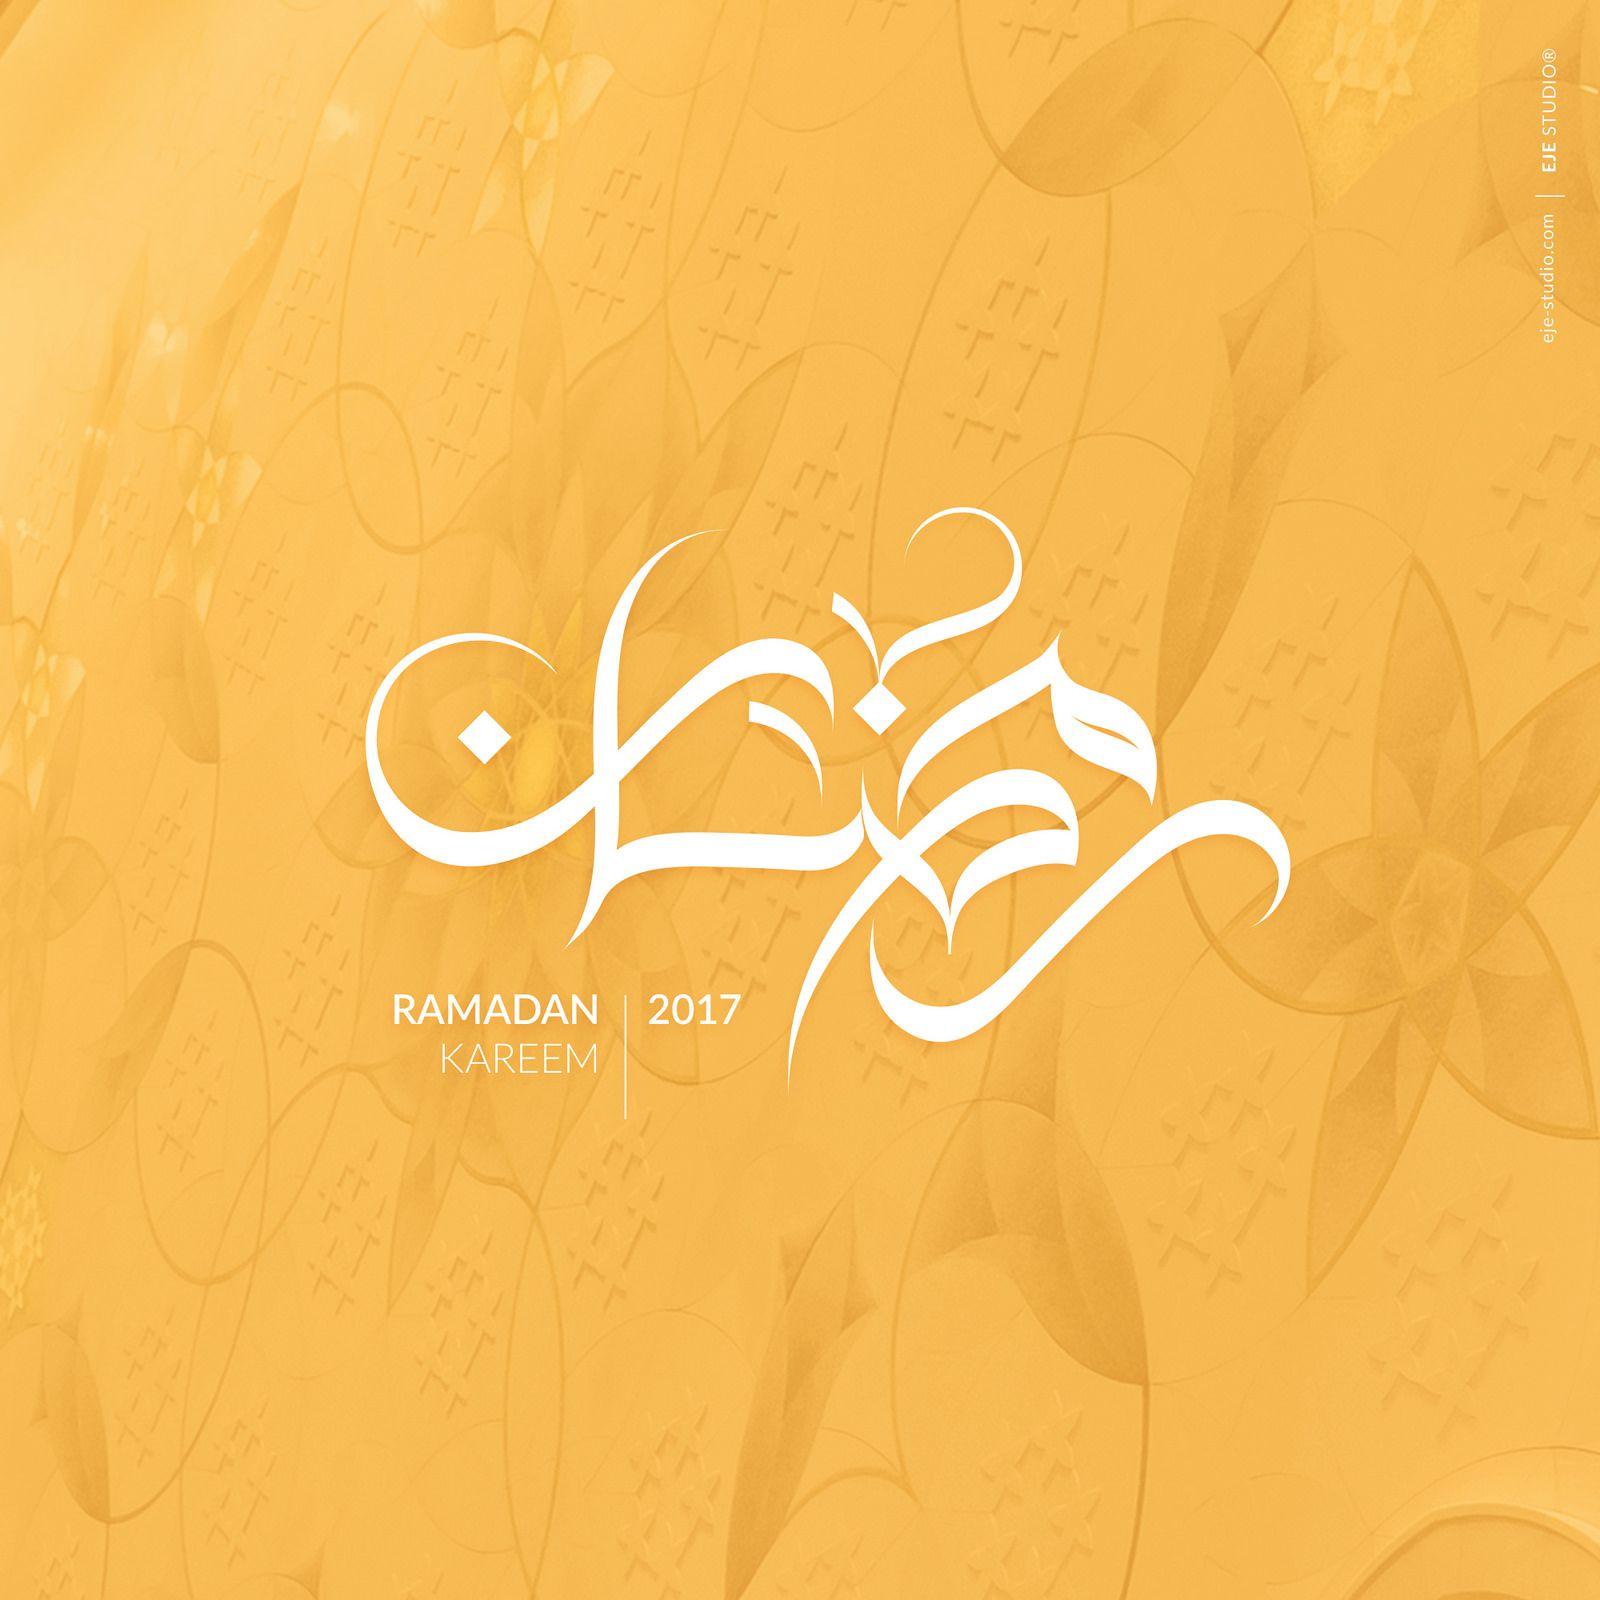 Ramadan Kareem Arabic Calligraphy By Eje Studio Ramadan Ramadan Kareem Ramadan Greetings